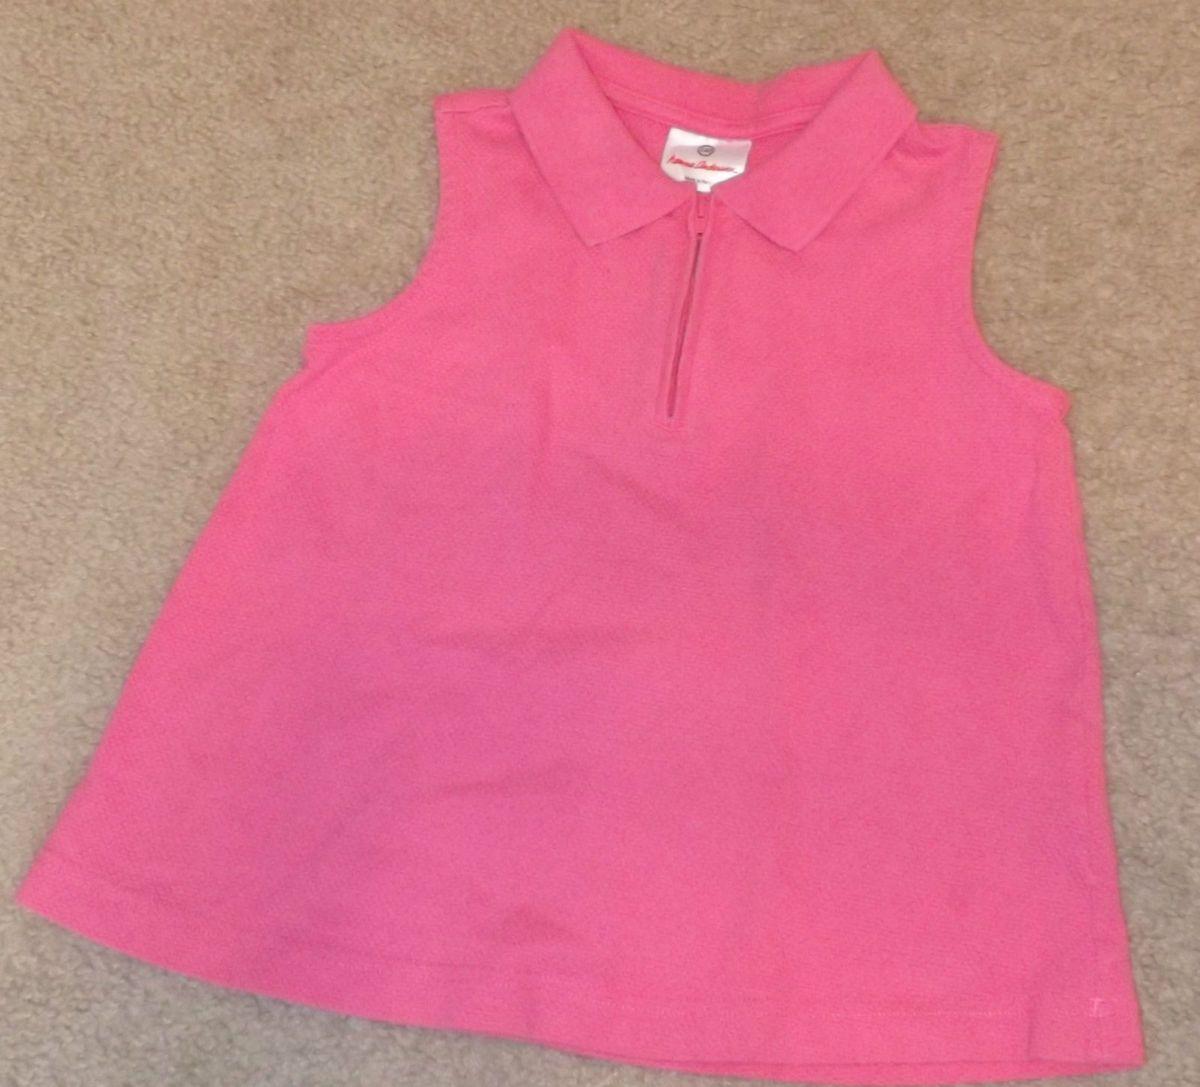 Hanna Andersson Girls Pink Sleeveless Shirt Top 110